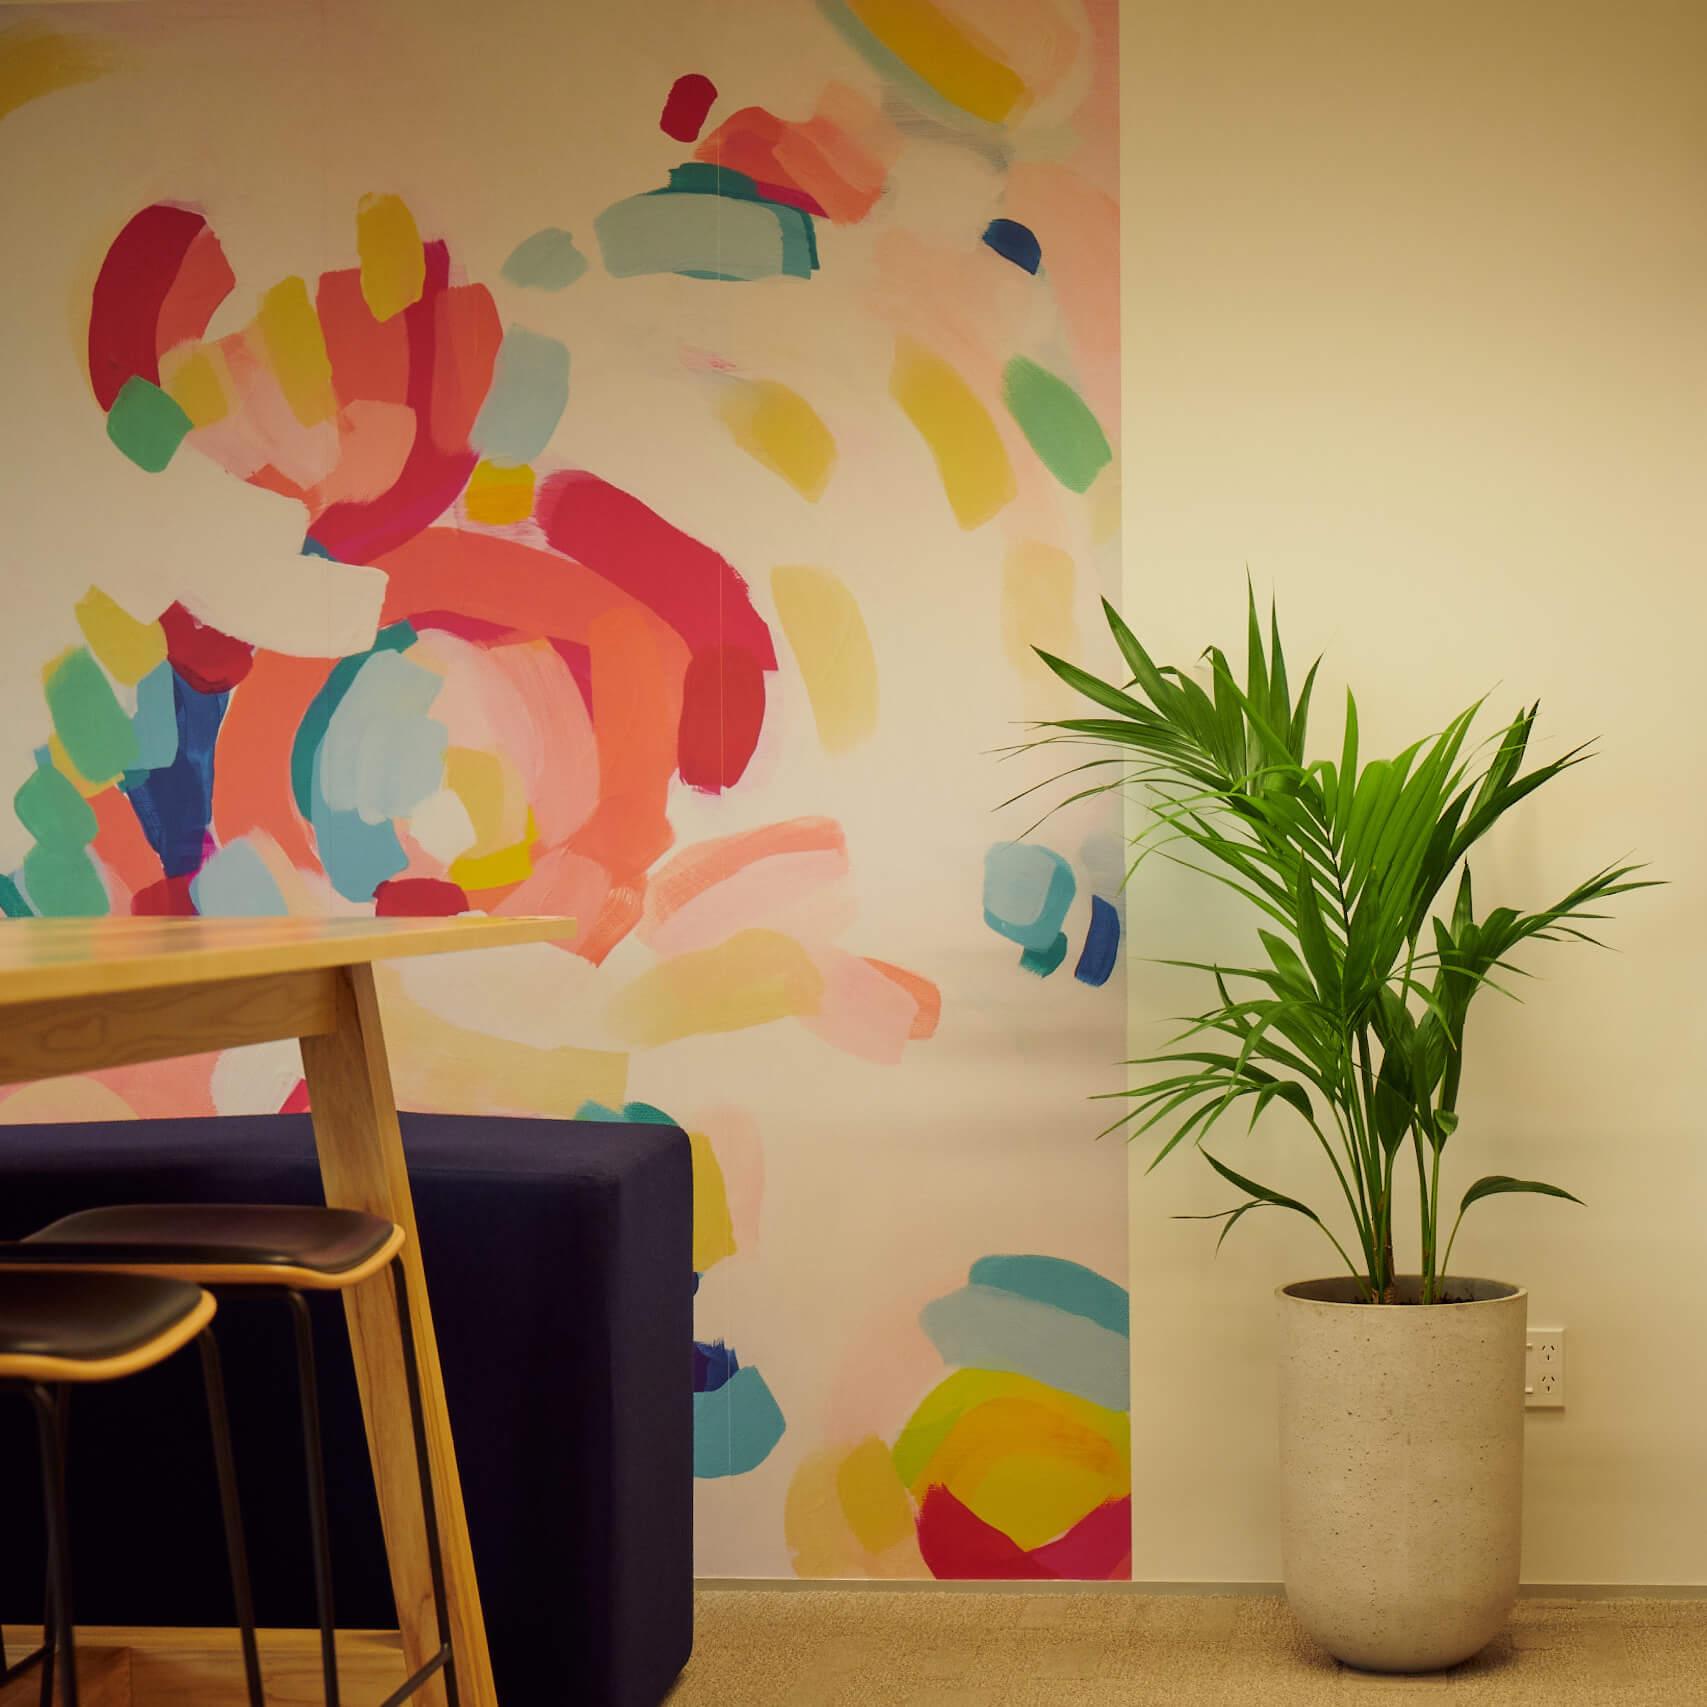 portfolio-offices-spaces-martinjenkins-image2